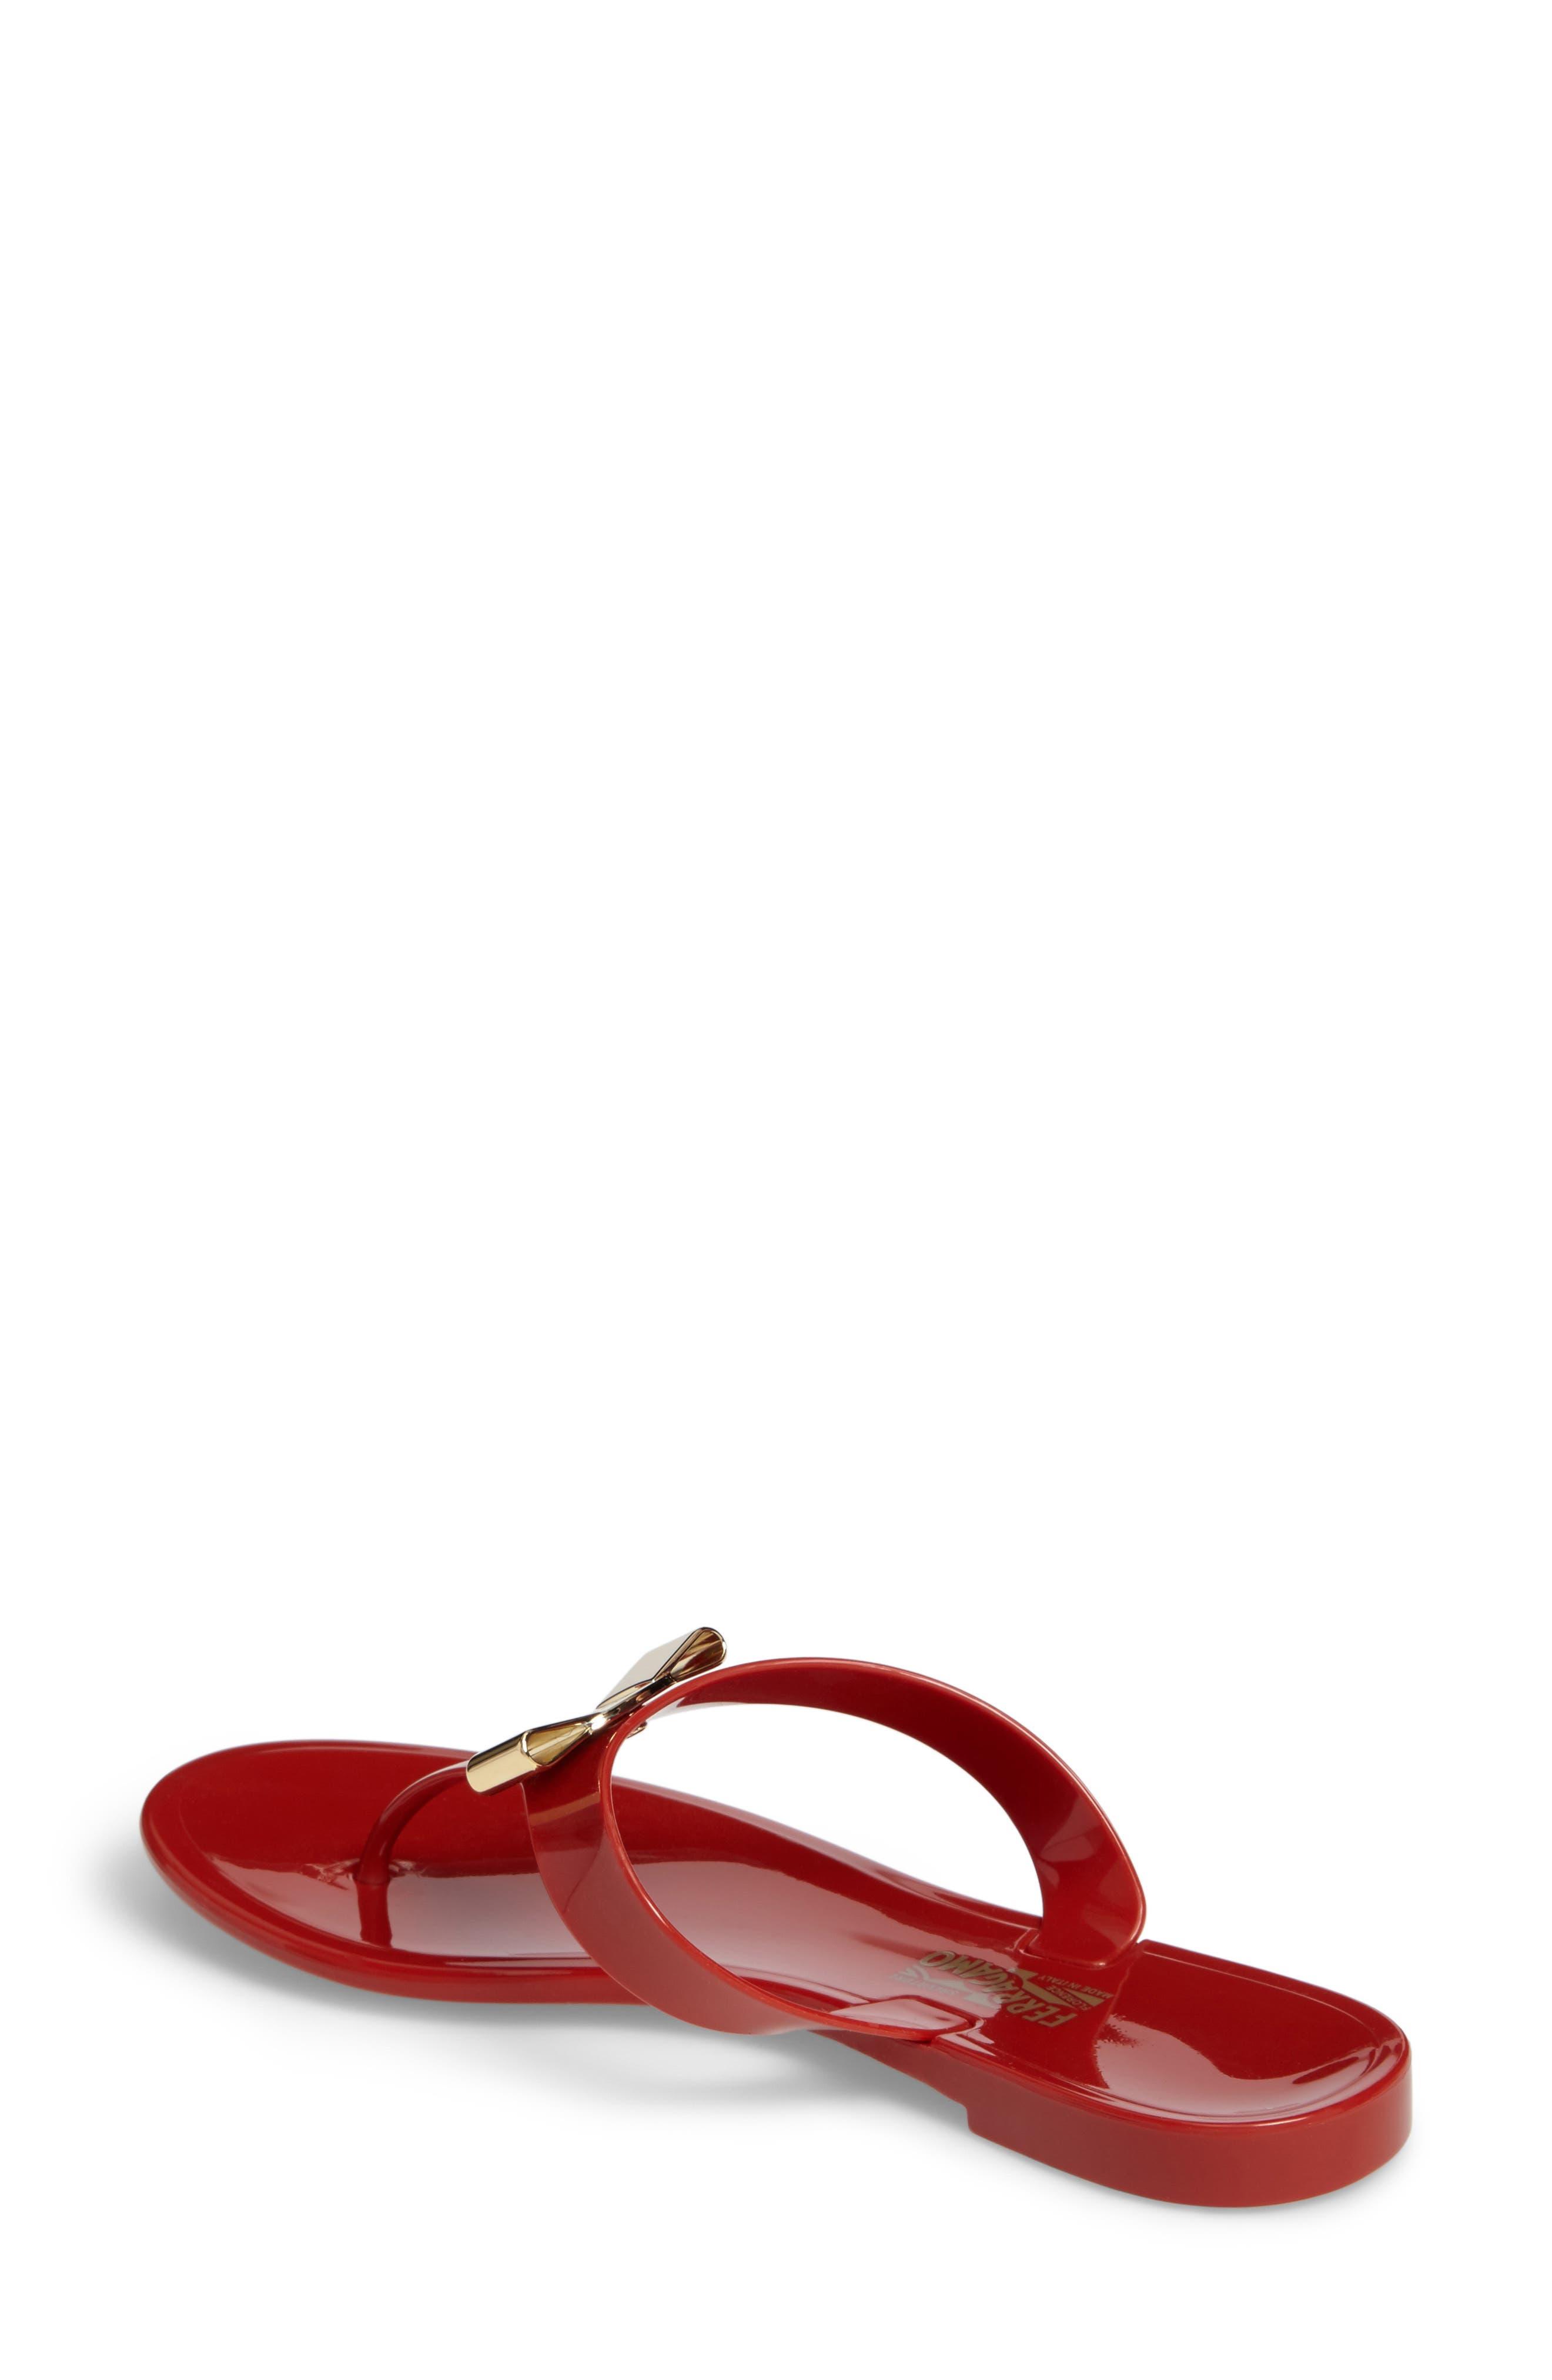 Farelia Jelly Flat Bow Sandal,                             Alternate thumbnail 2, color,                             Red Pvc